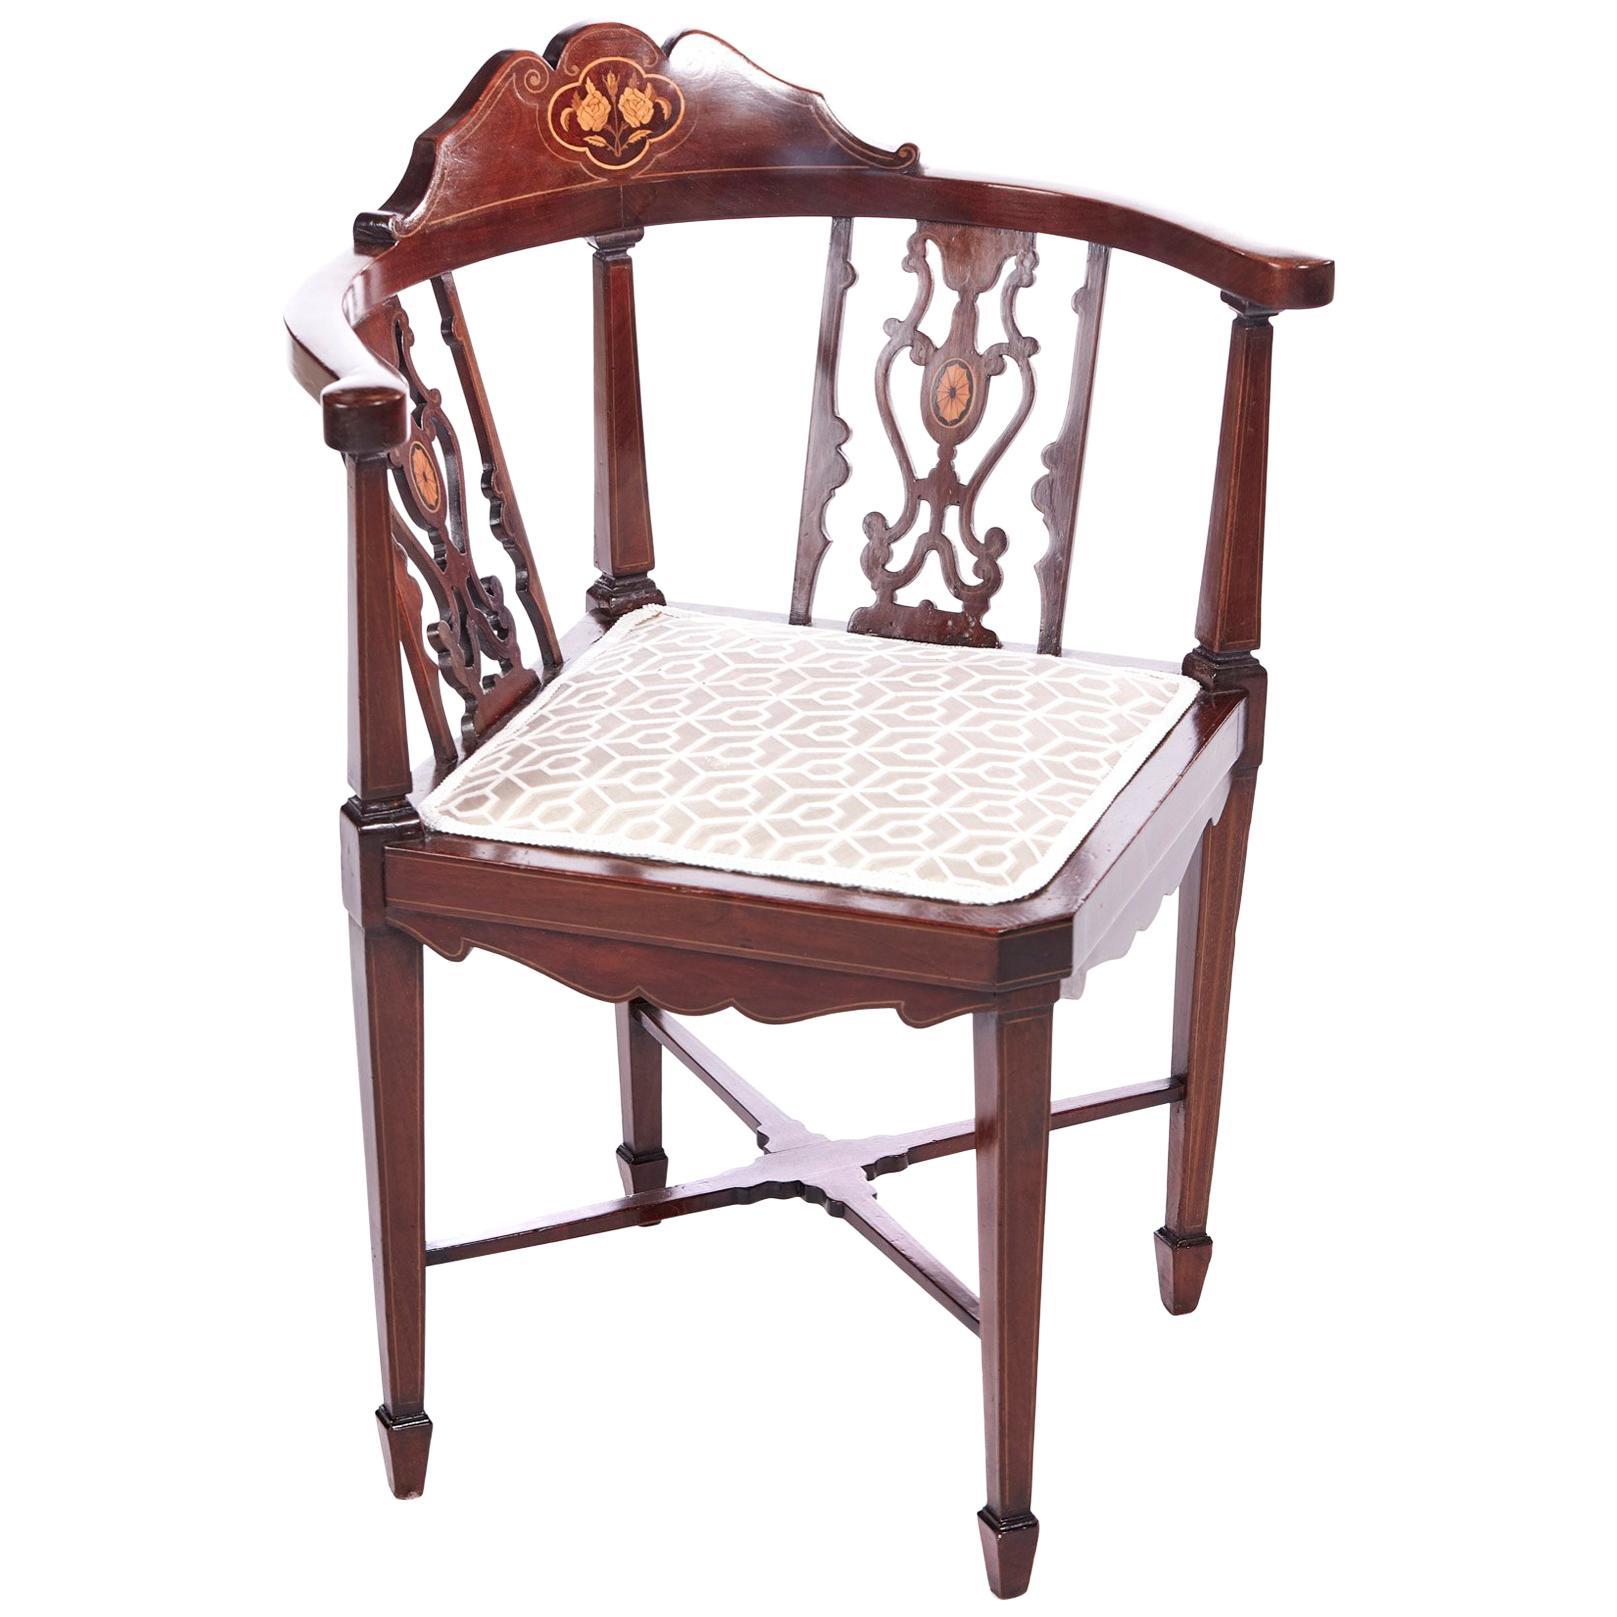 Elegant Mellow Mahogany Edwardian Hepplewhite Design Antique Dining Chairs Antique Furniture Edwardian (1901-1910)